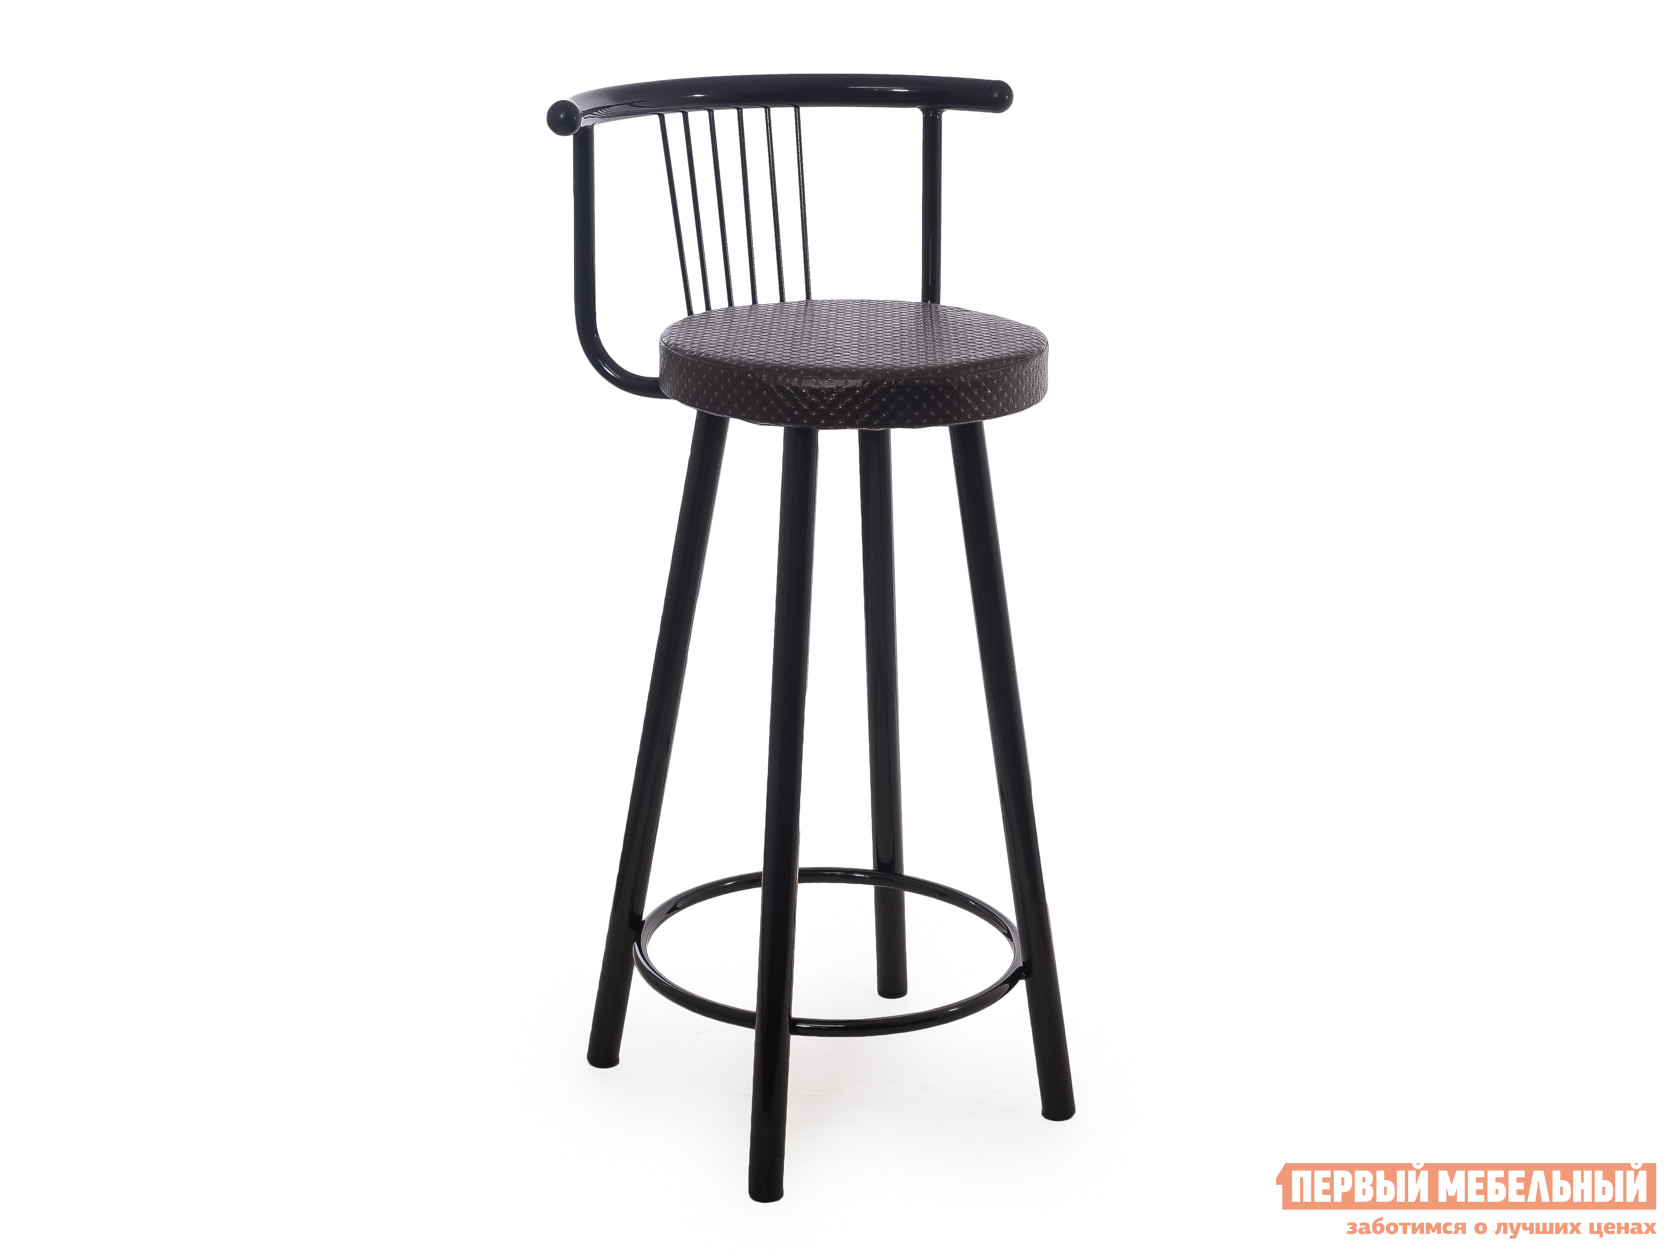 Барный стул Амис Барный Стиль Бронза блеск от Купистол